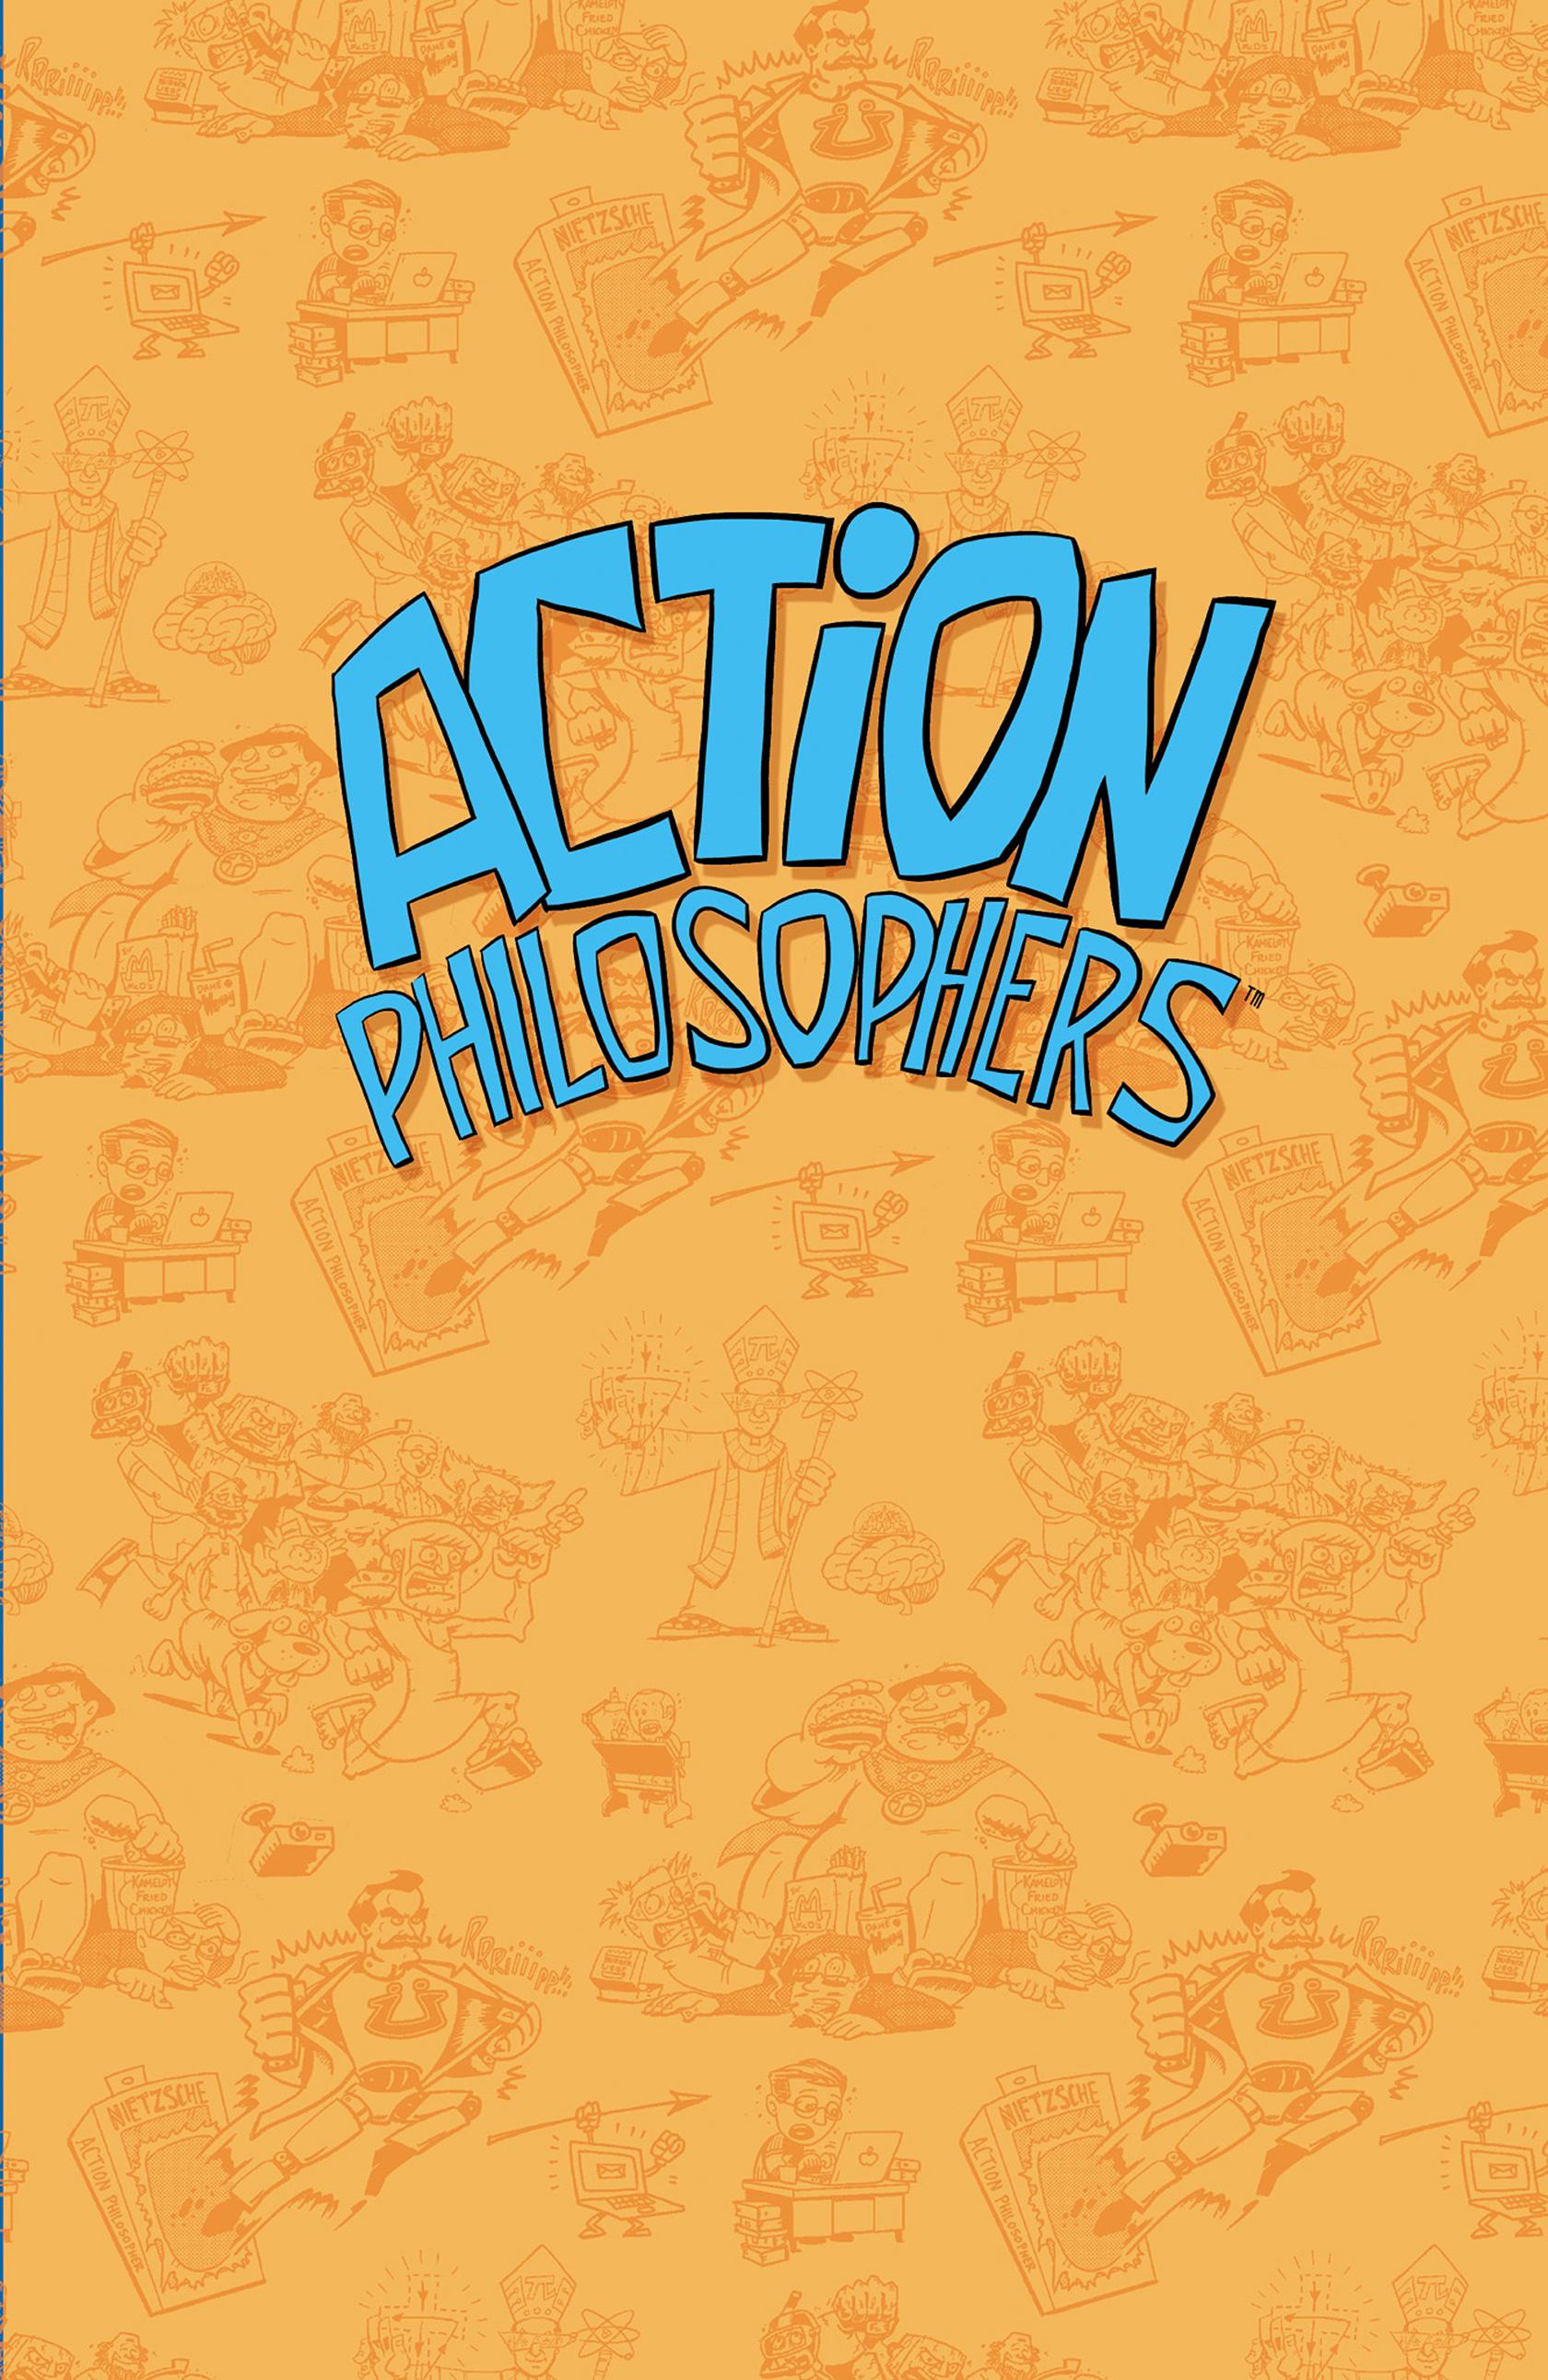 Read online Action Philosophers! comic -  Issue #Action Philosophers! TPB (Part 1) - 2